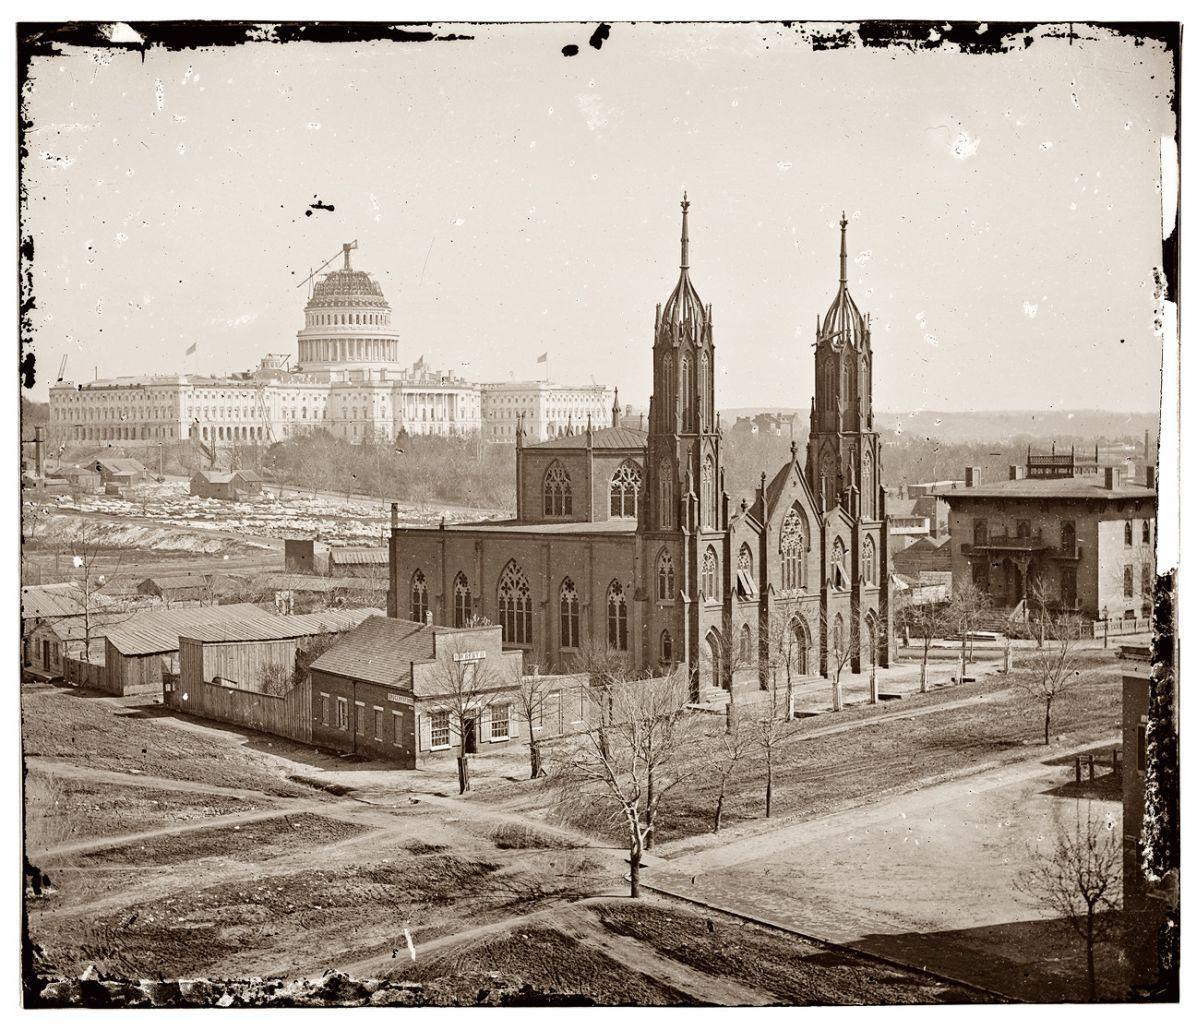 Вашингтон, 1863 год. Даже по фото видно, что кое-где ещё «квакают лягушки»